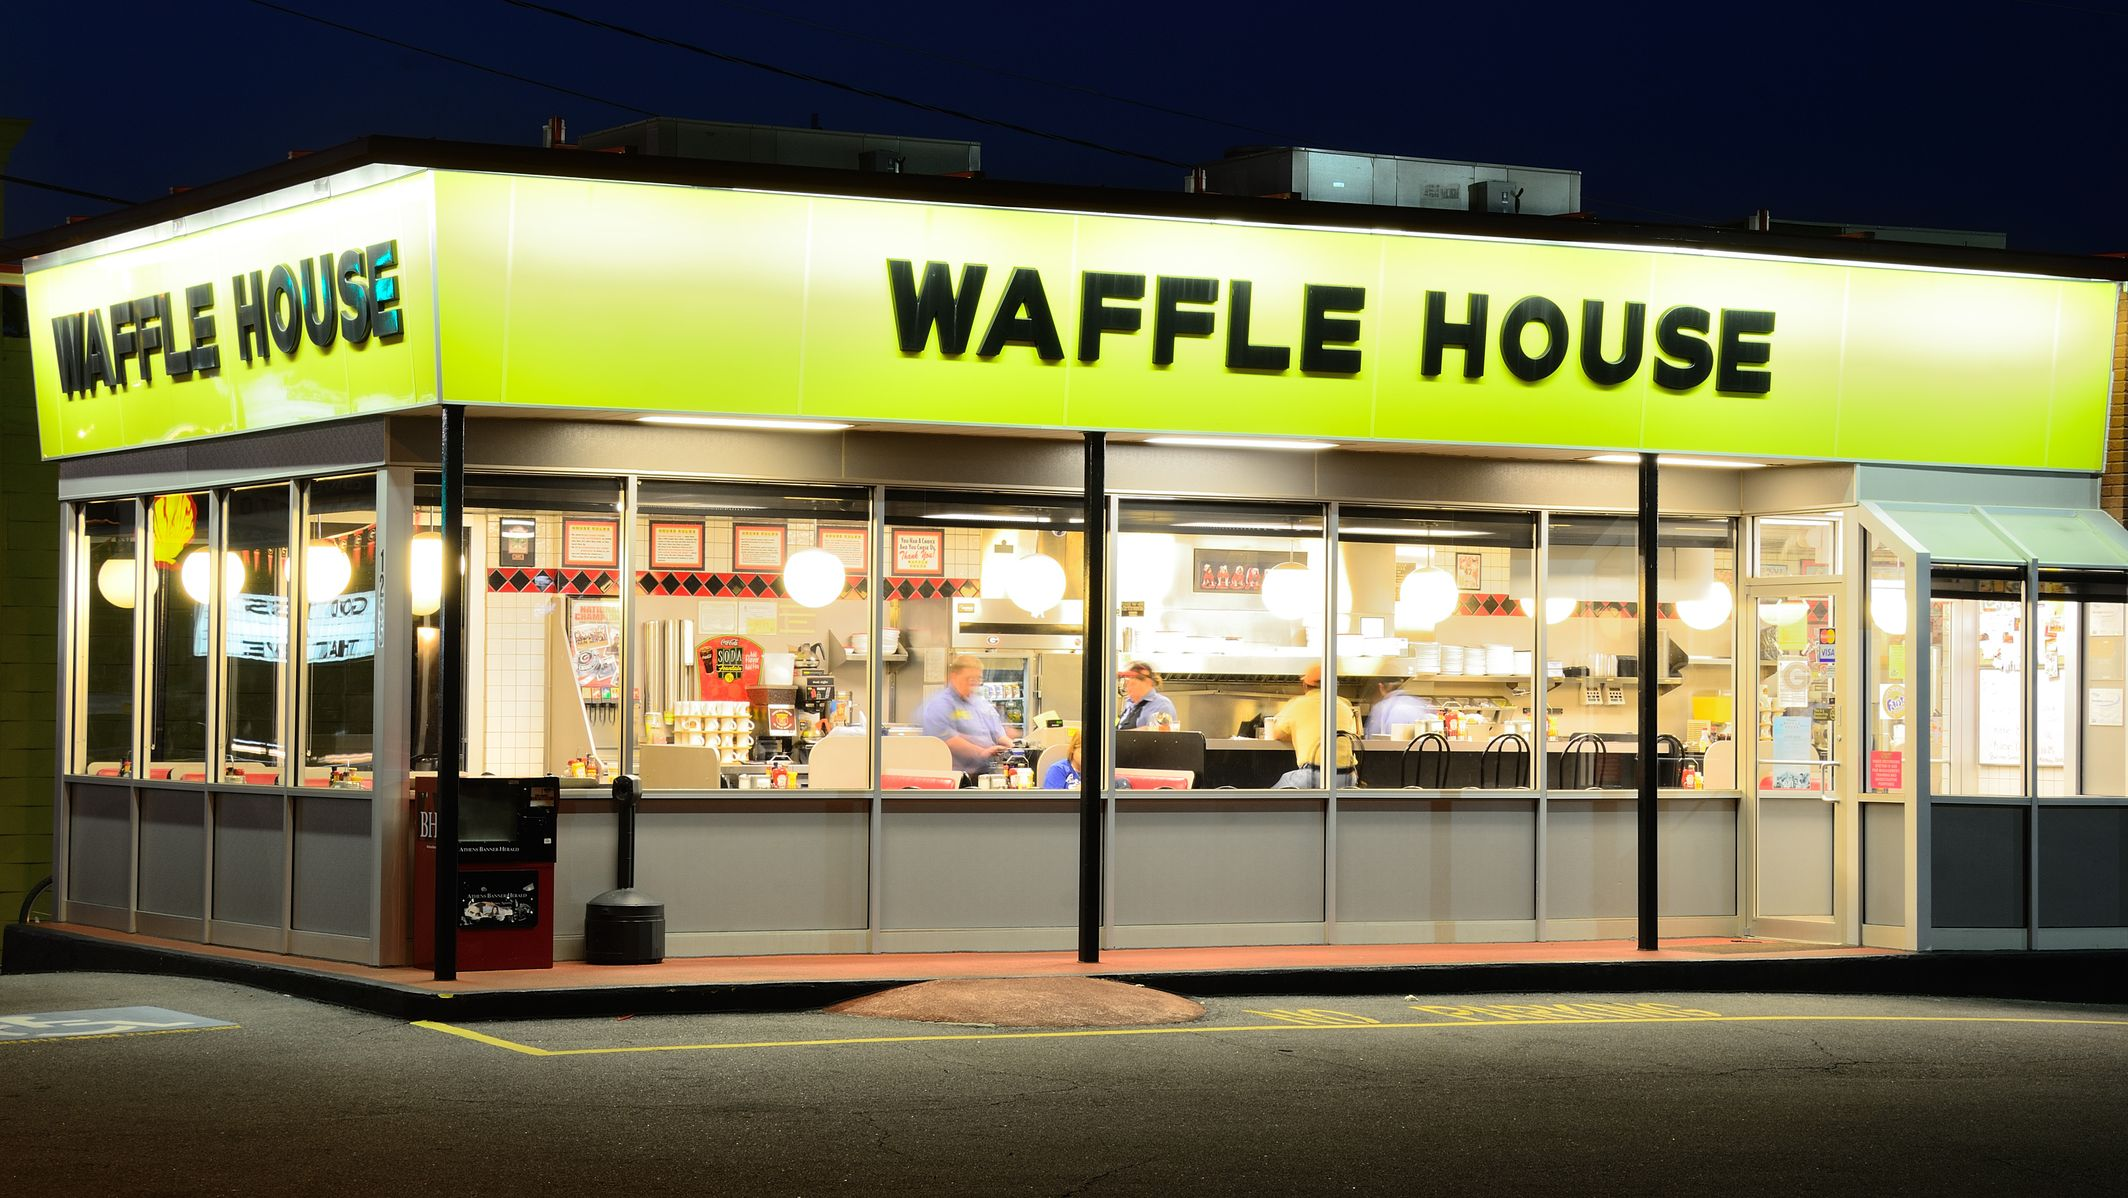 6 Tasty Bits of Waffle House Kitchen Slang